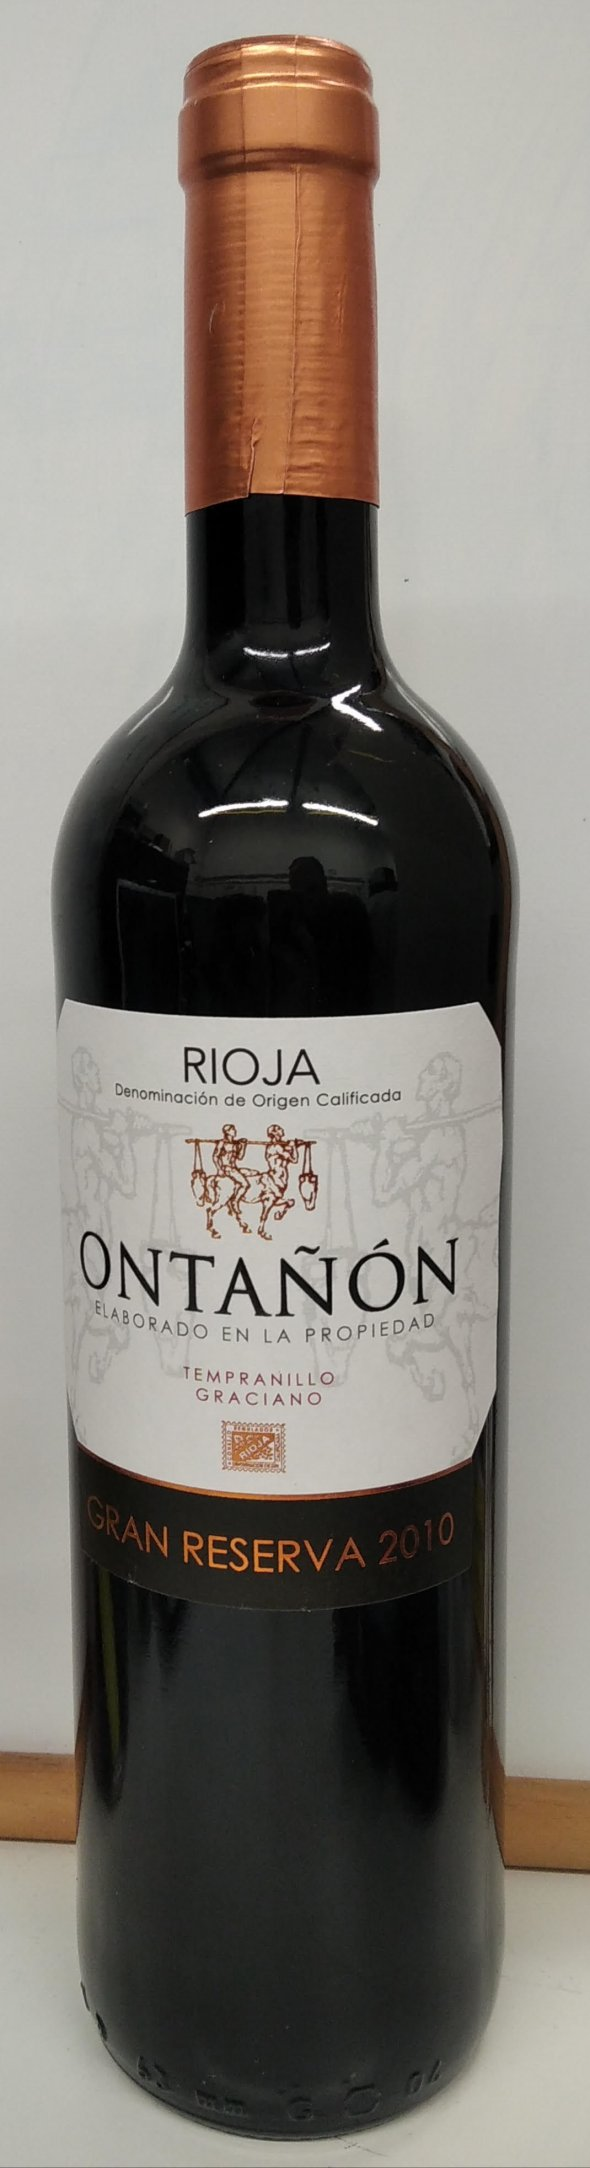 Ontanon, Gran Reserva, Rioja